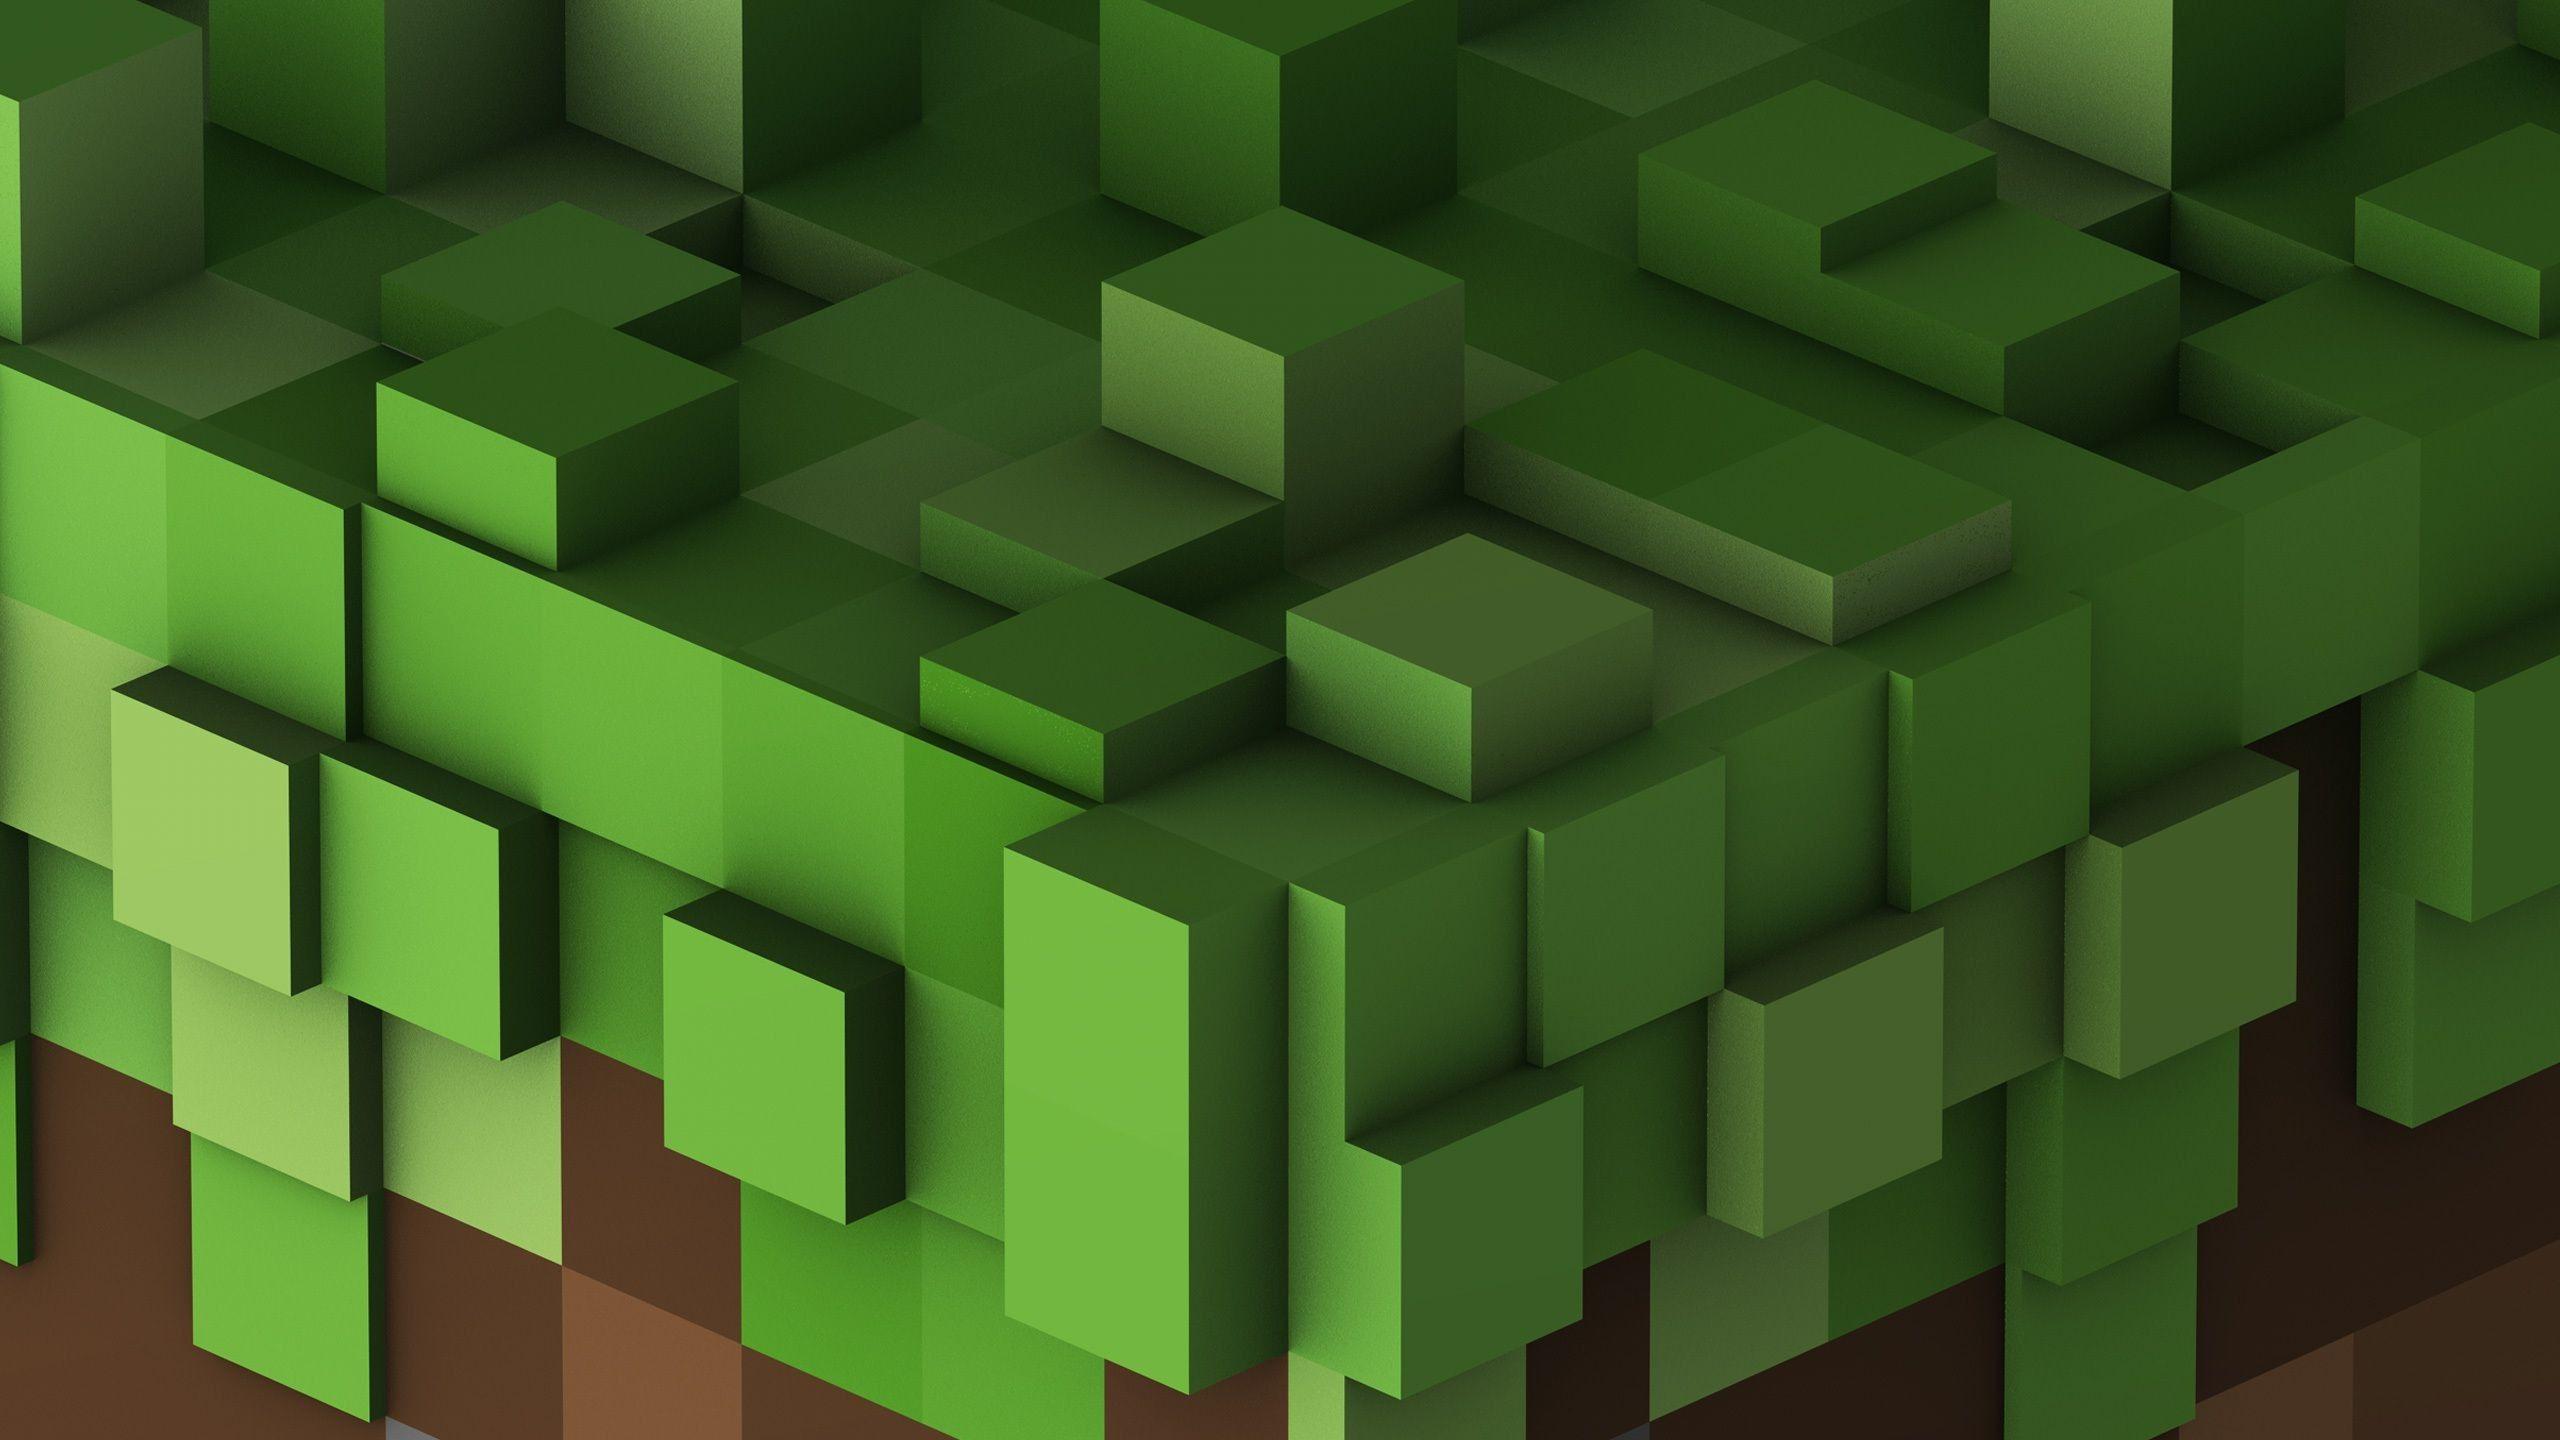 Minecraft Wallpaper Diamond Sword Minecraft Wallpaper